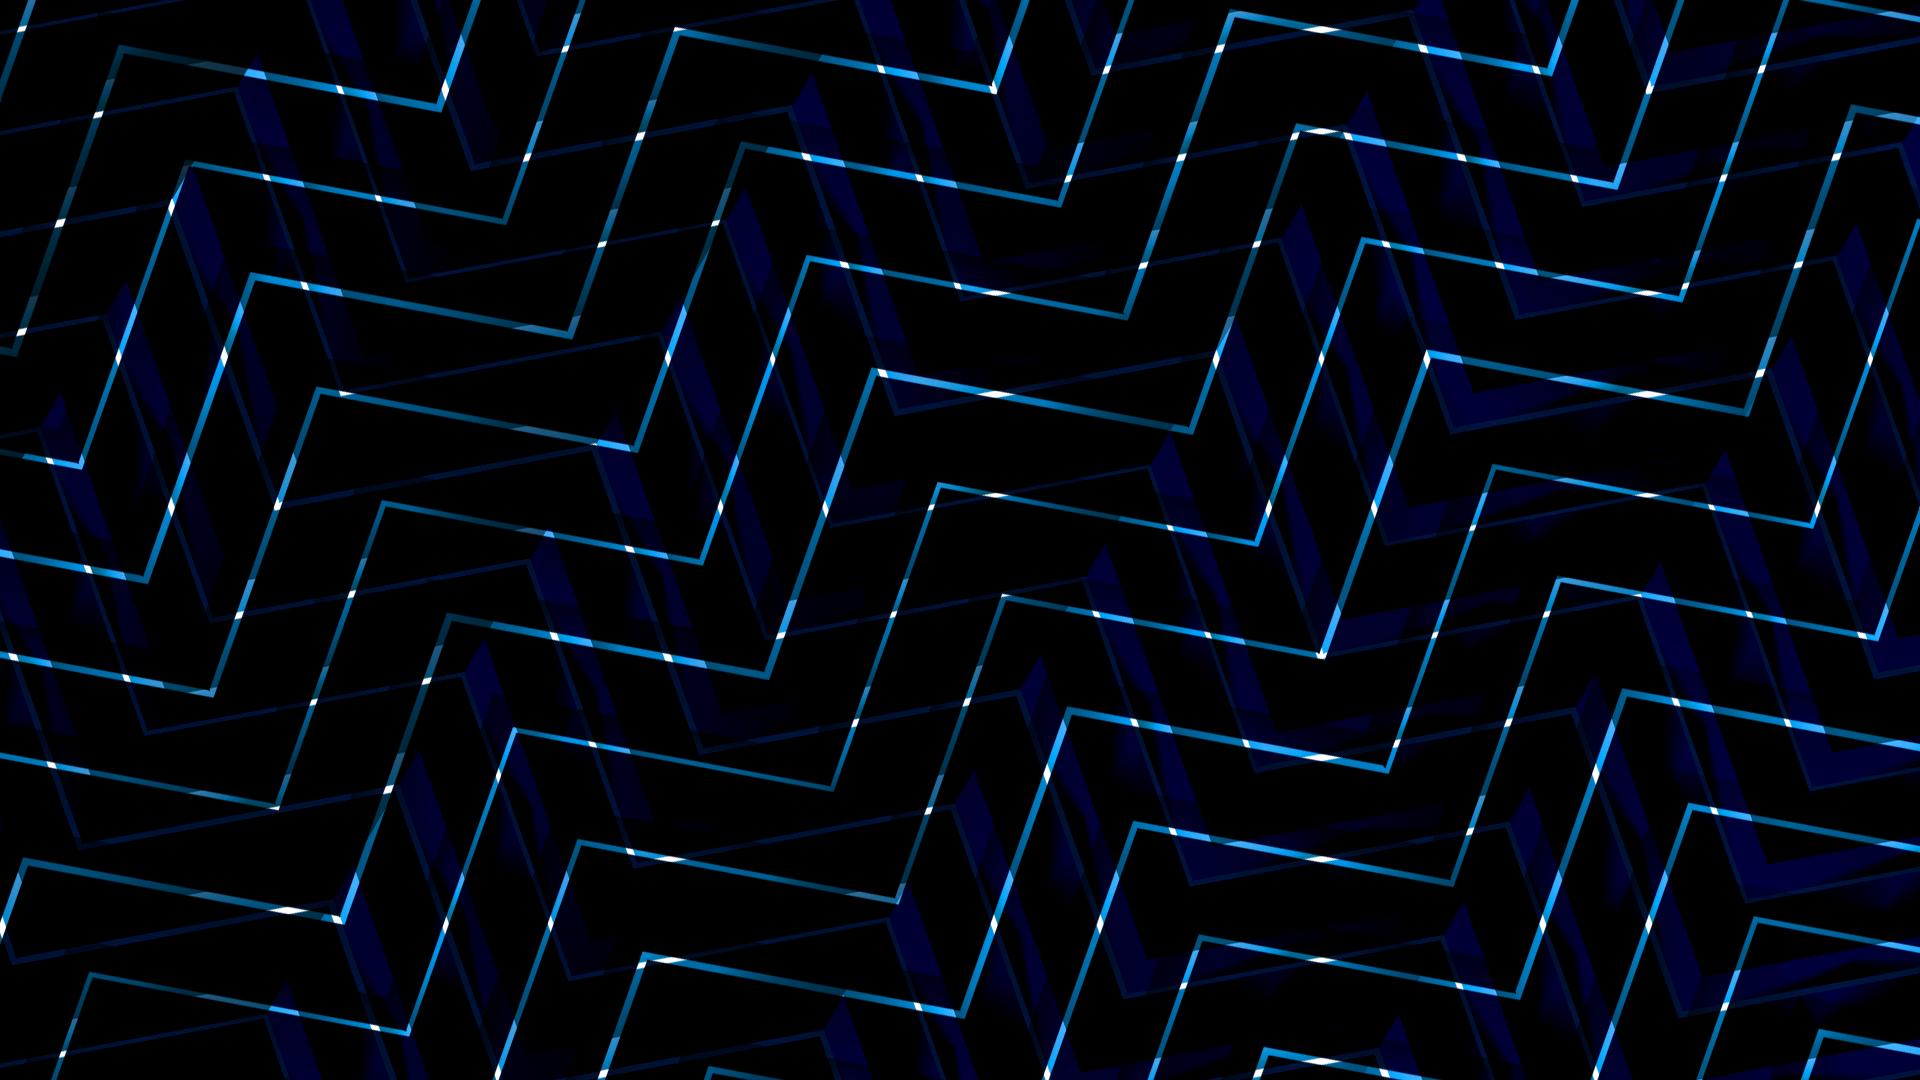 General 1920x1080 lines pattern square blocky dark shiny